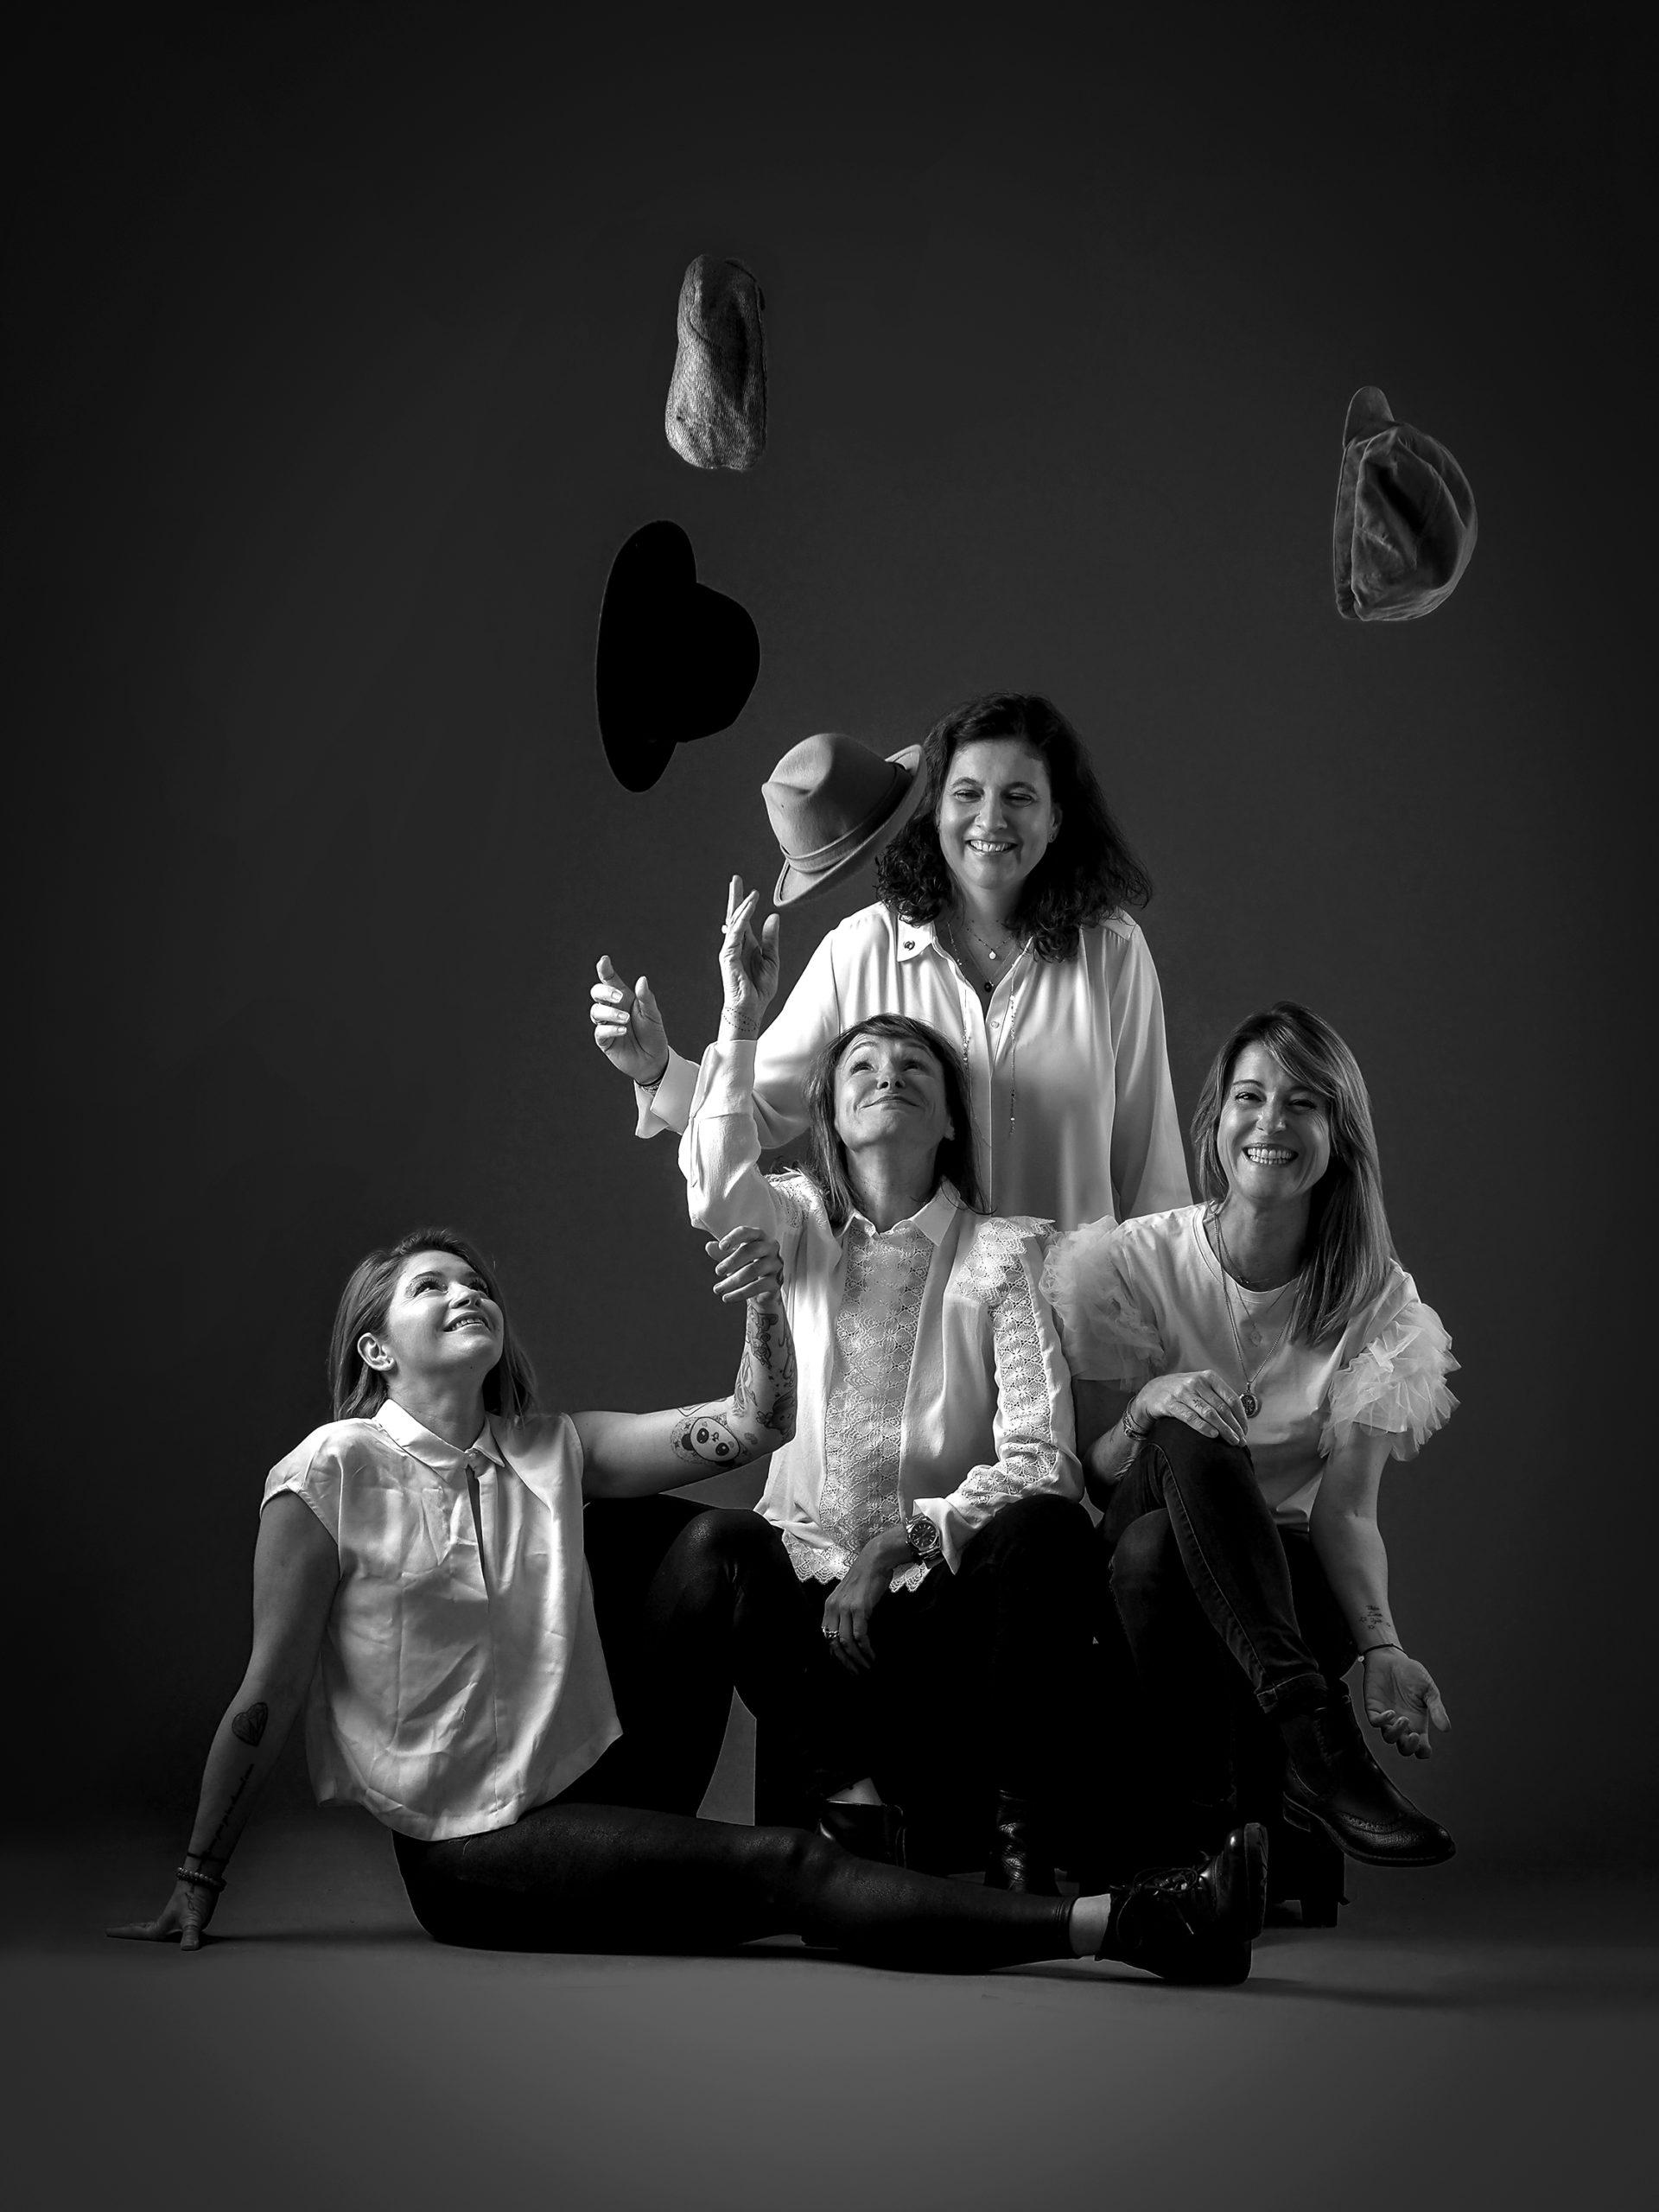 Sensivia-photographe-portraitiste-groupe-entre-amies